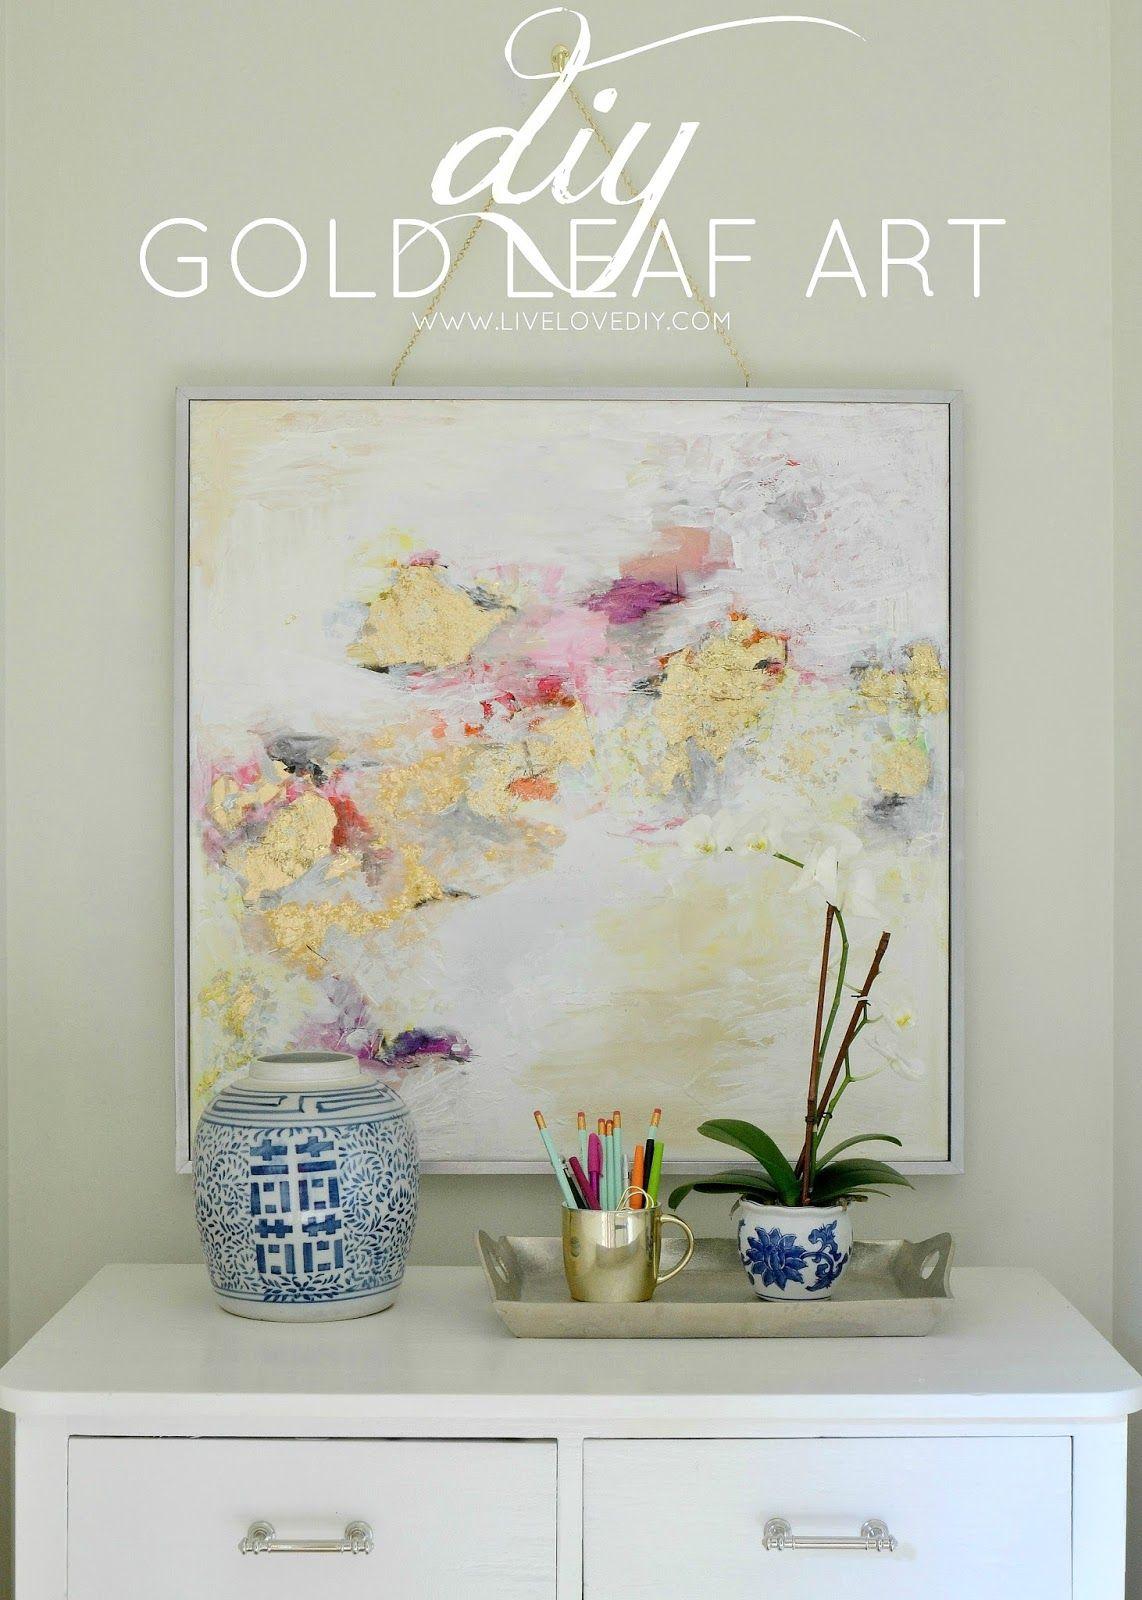 How To Make Gold Leaf Art (Round Two)! (LiveLoveDIY ... - photo #10